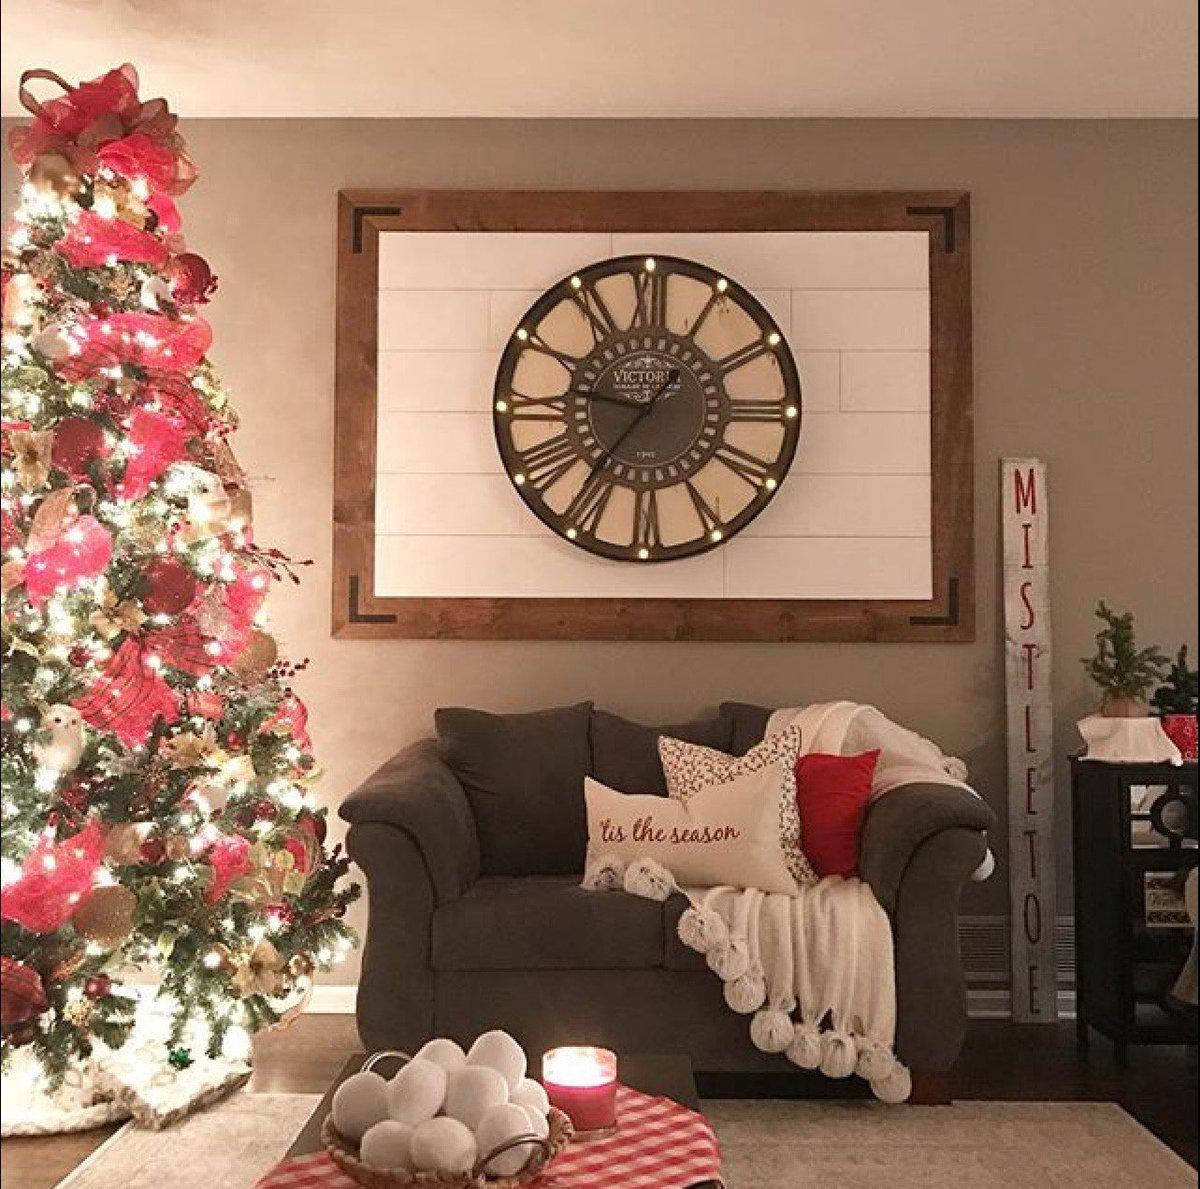 city furniture living room. 0 replies retweets likes Value City Furniture  ValueCityFurn Twitter